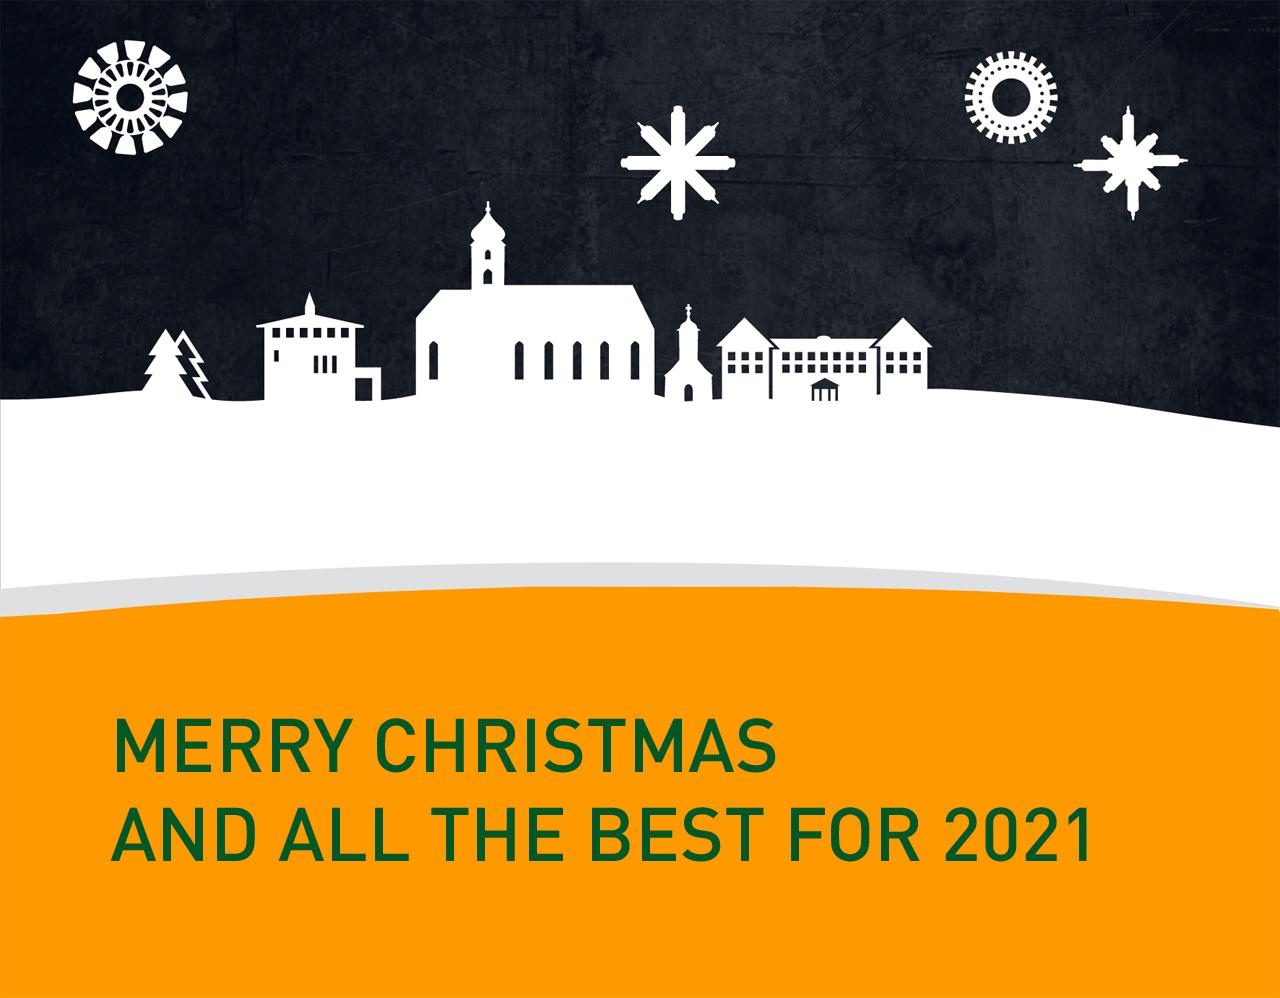 SycoTec wishes Merry Christmas!